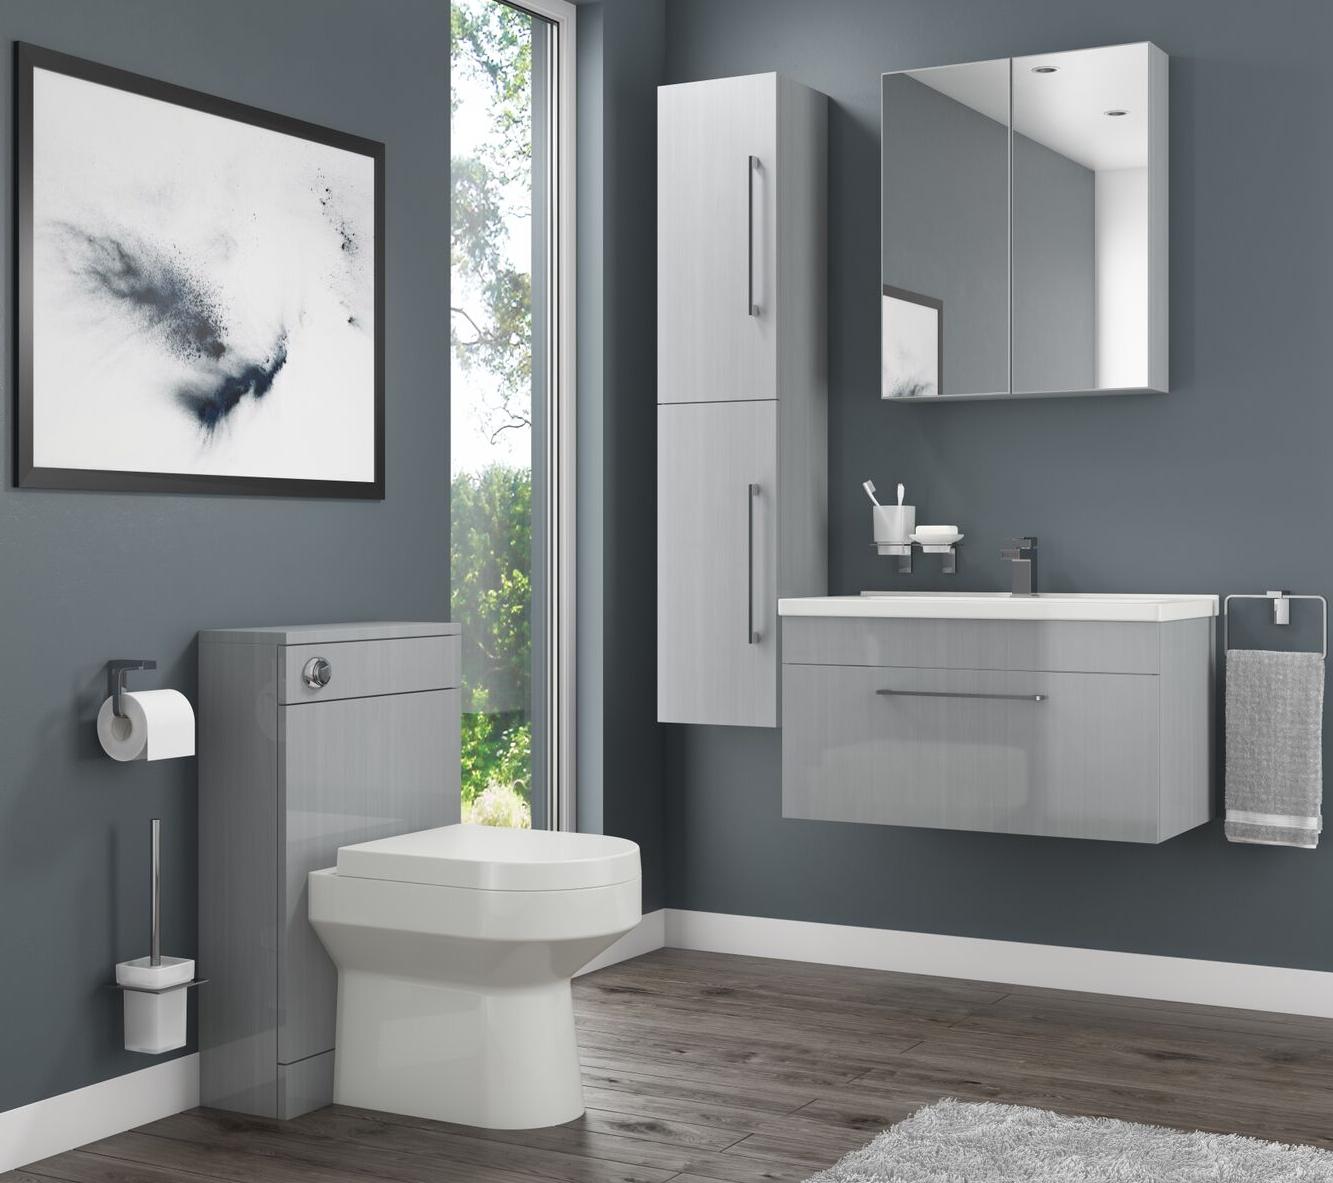 Moderno Grey Bathroom Collection Vanity Basin Unit Toilet Unit Bathroom Storage Cabinet Wal Freestanding Bathroom Furniture Bathroom Collections Furniture